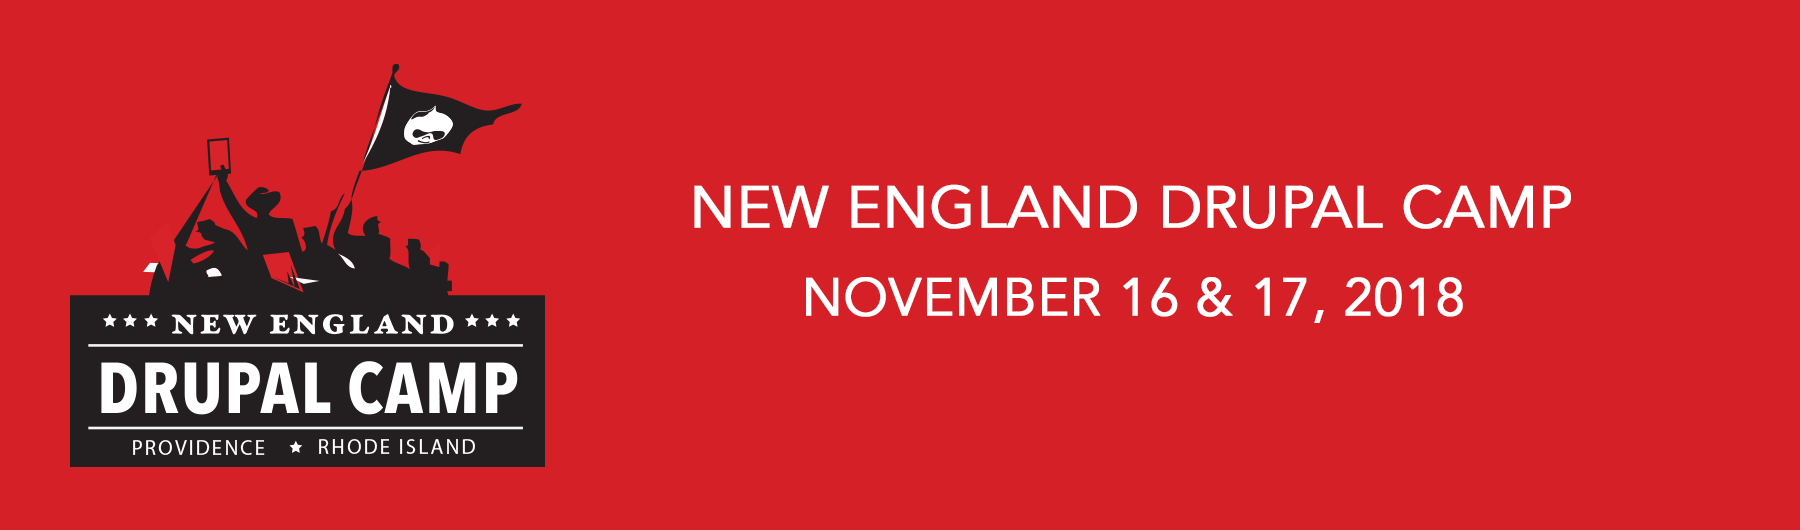 New England Drupal Camp Training